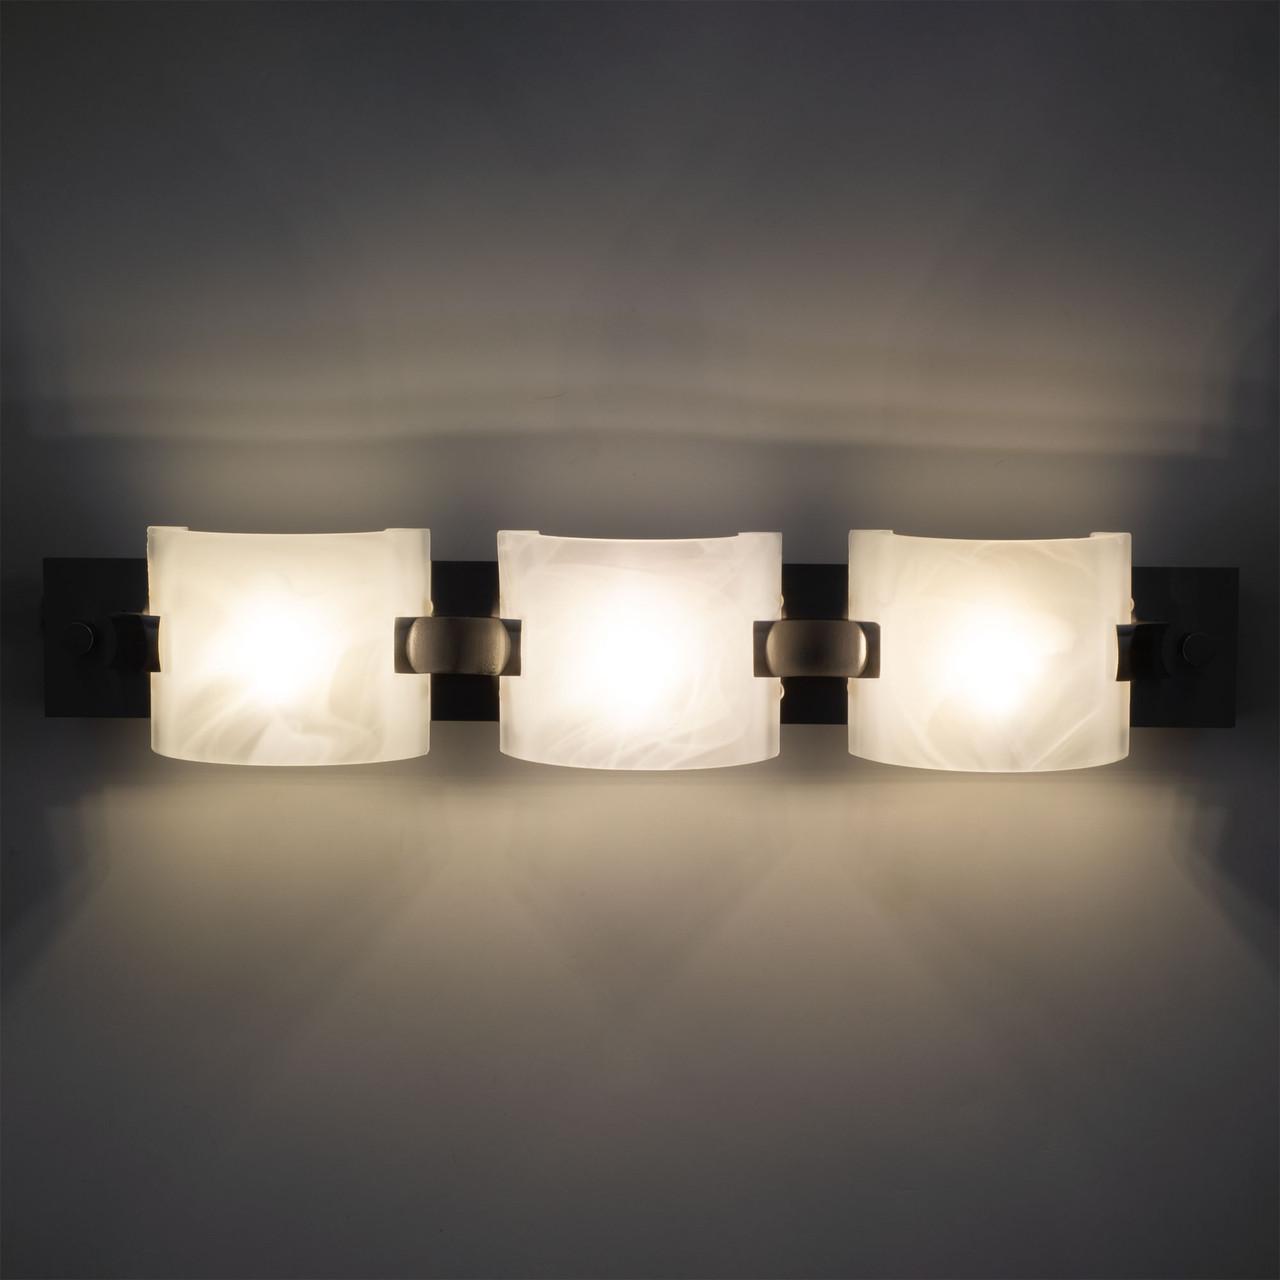 18 Rv Vanity Light 12v Led Brushed Nickel Recpro